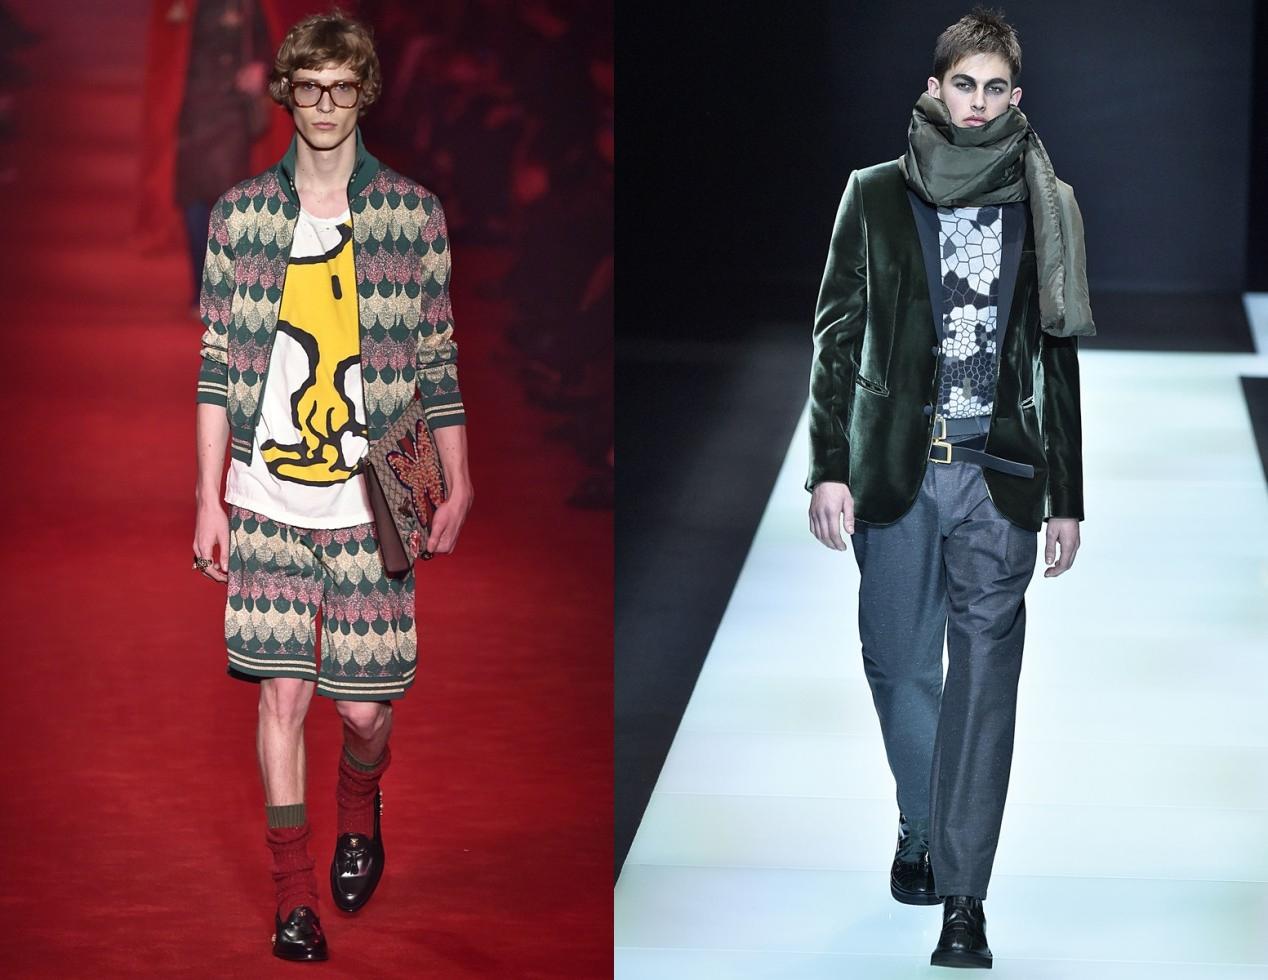 milan fashion week, review, trend, tendencia masculina, moda masculina, style, estilo, alex cursino, moda sem censura, blogger, fashion blogger, blog, menswear, social media, digital influencer, 222